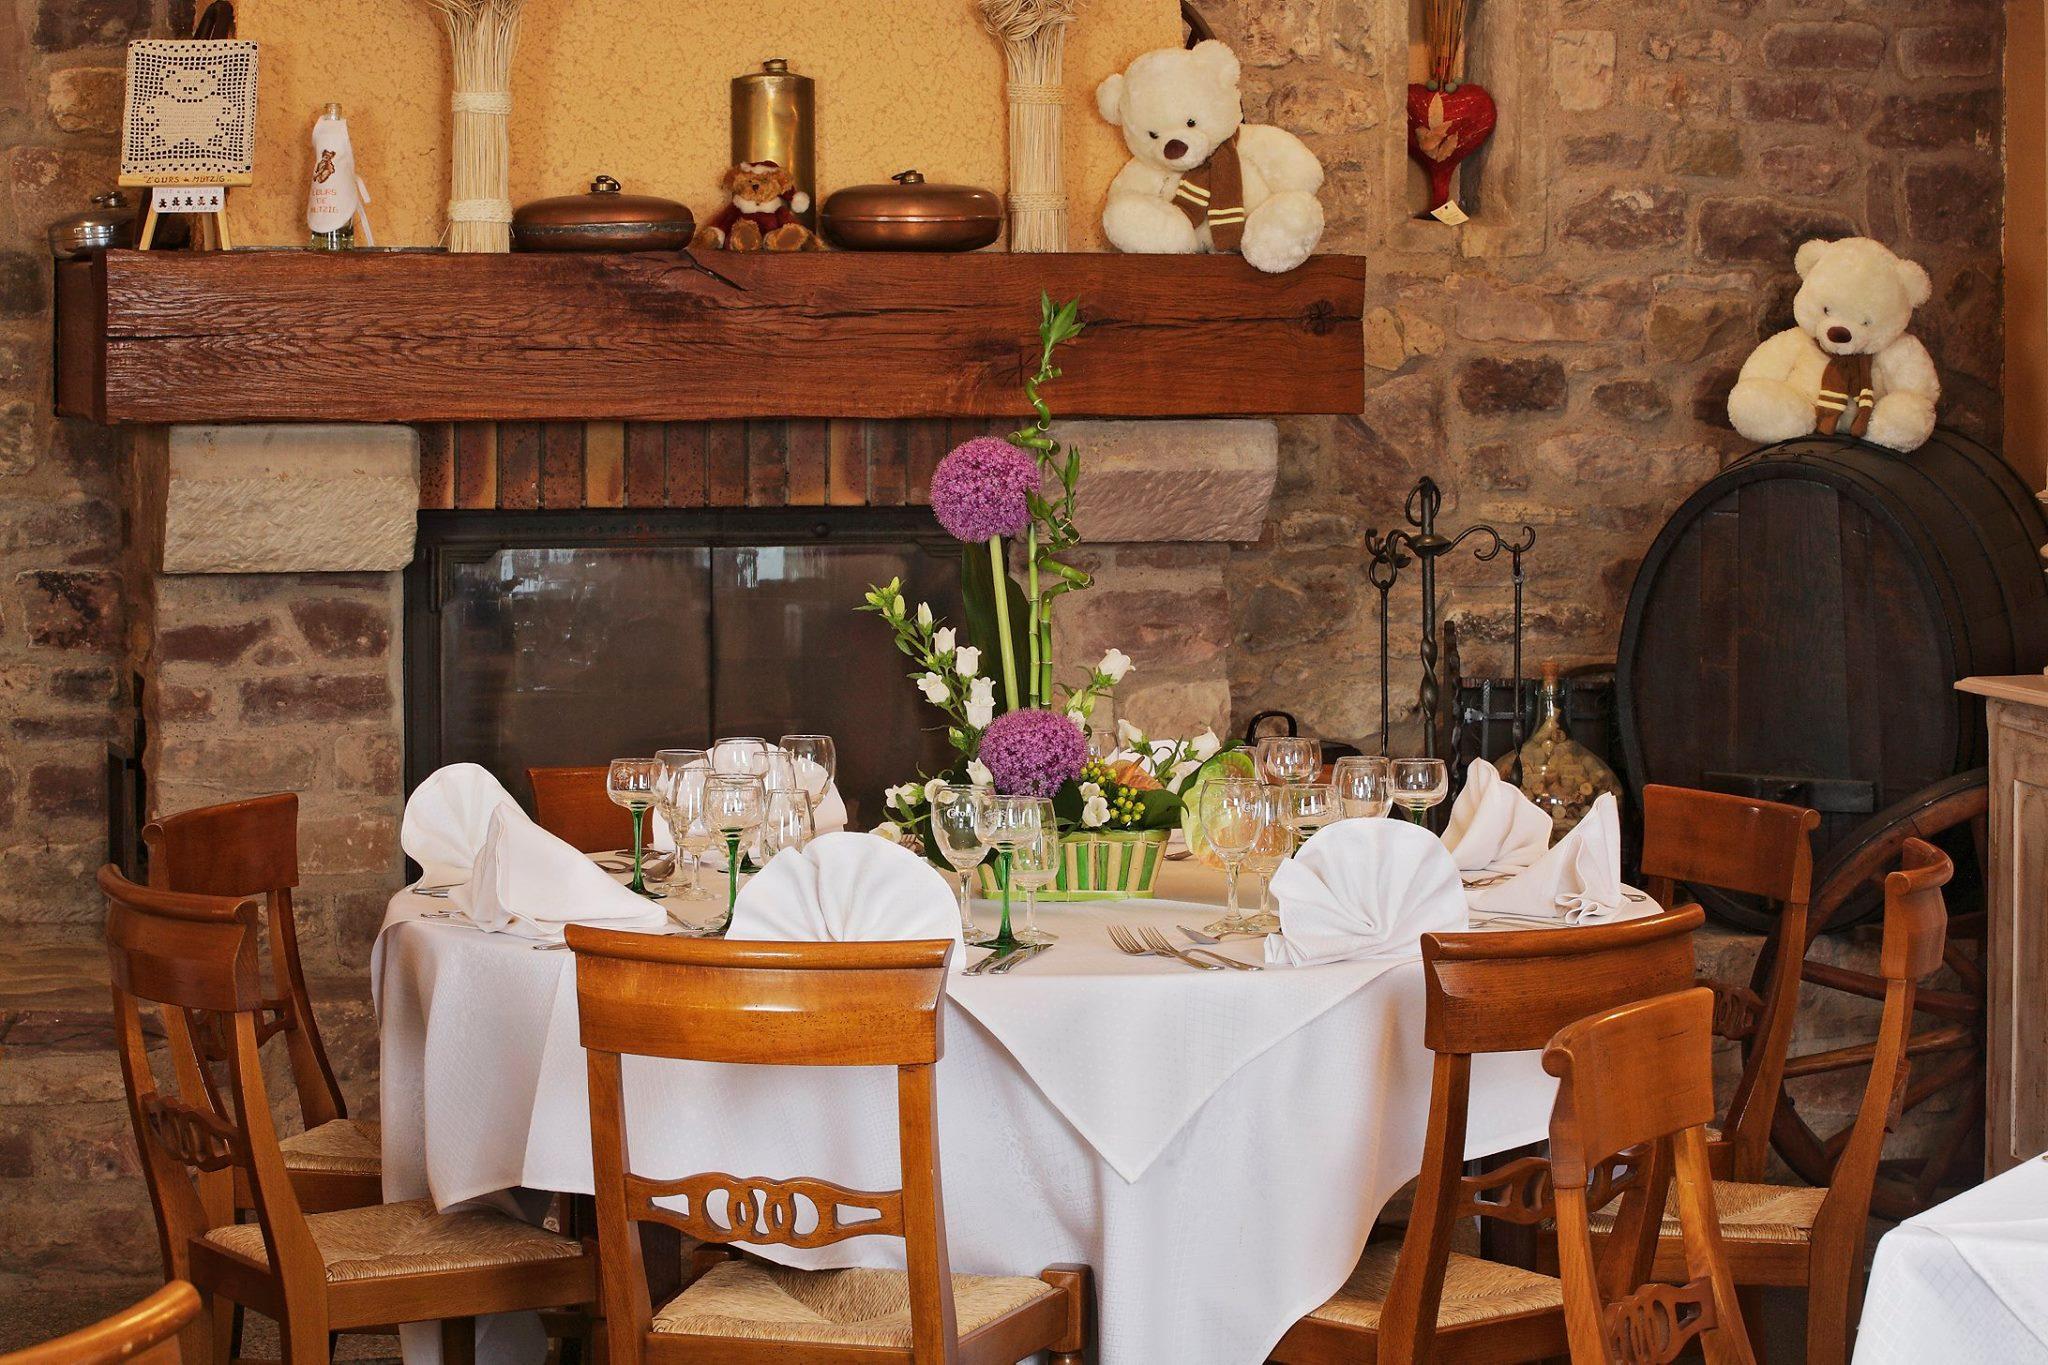 Hotel-restaurant L'Ours de Mutzig